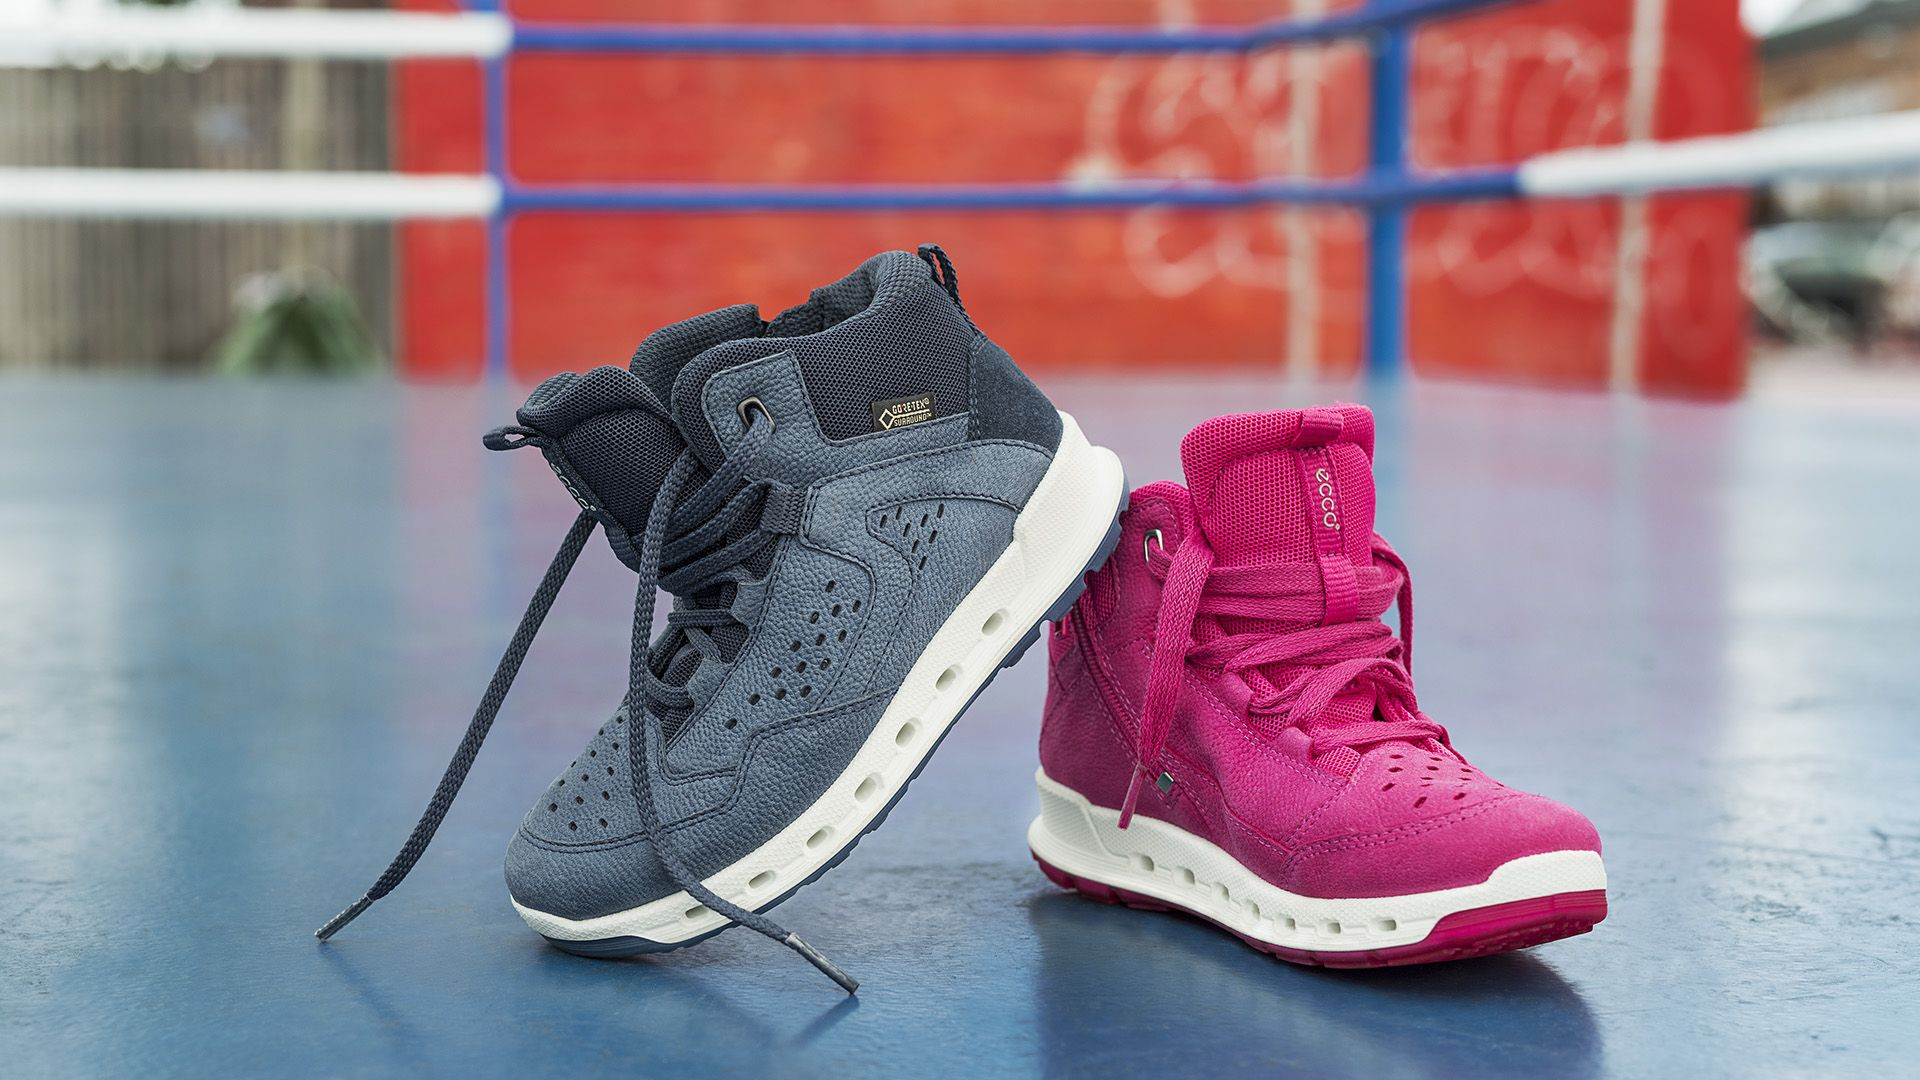 Ecco Oficjalny Sklep Internetowy Saucony Sneaker Sneakers Shoes